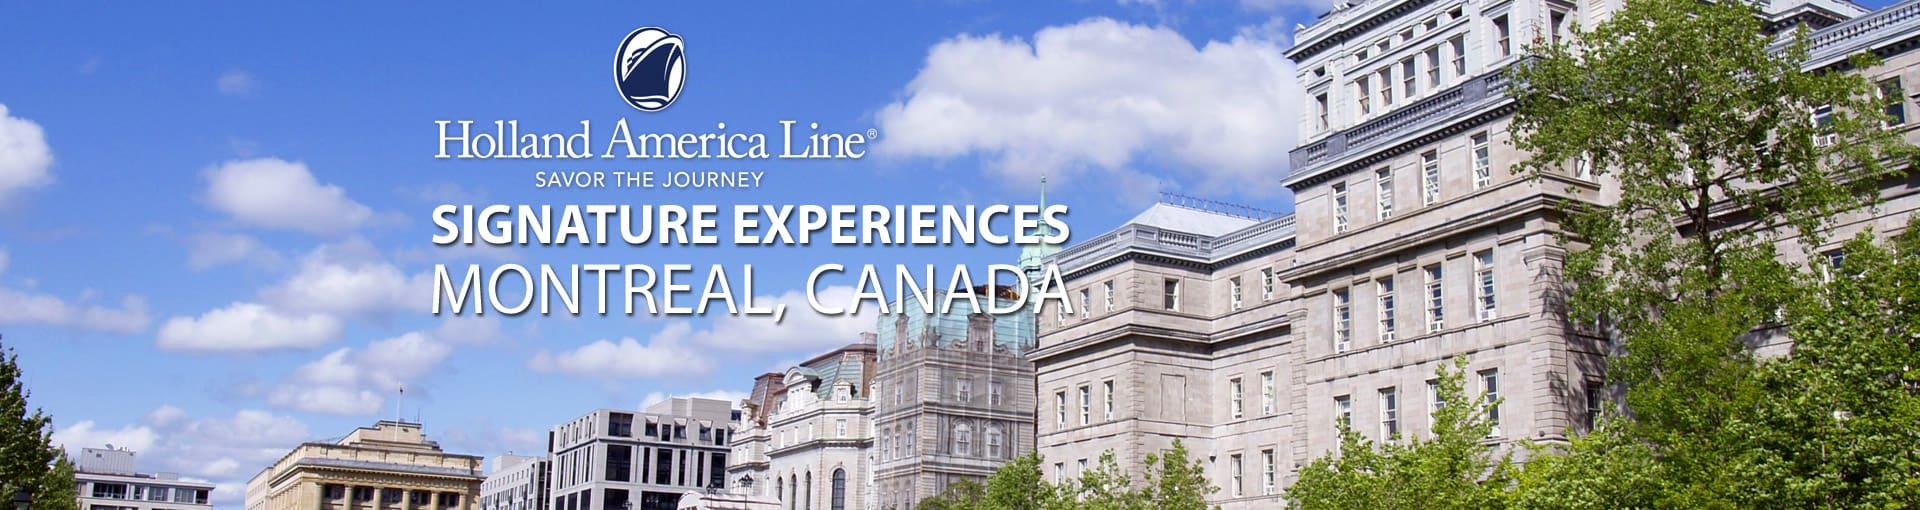 Holland America Signature Experiences - Montreal, Canada